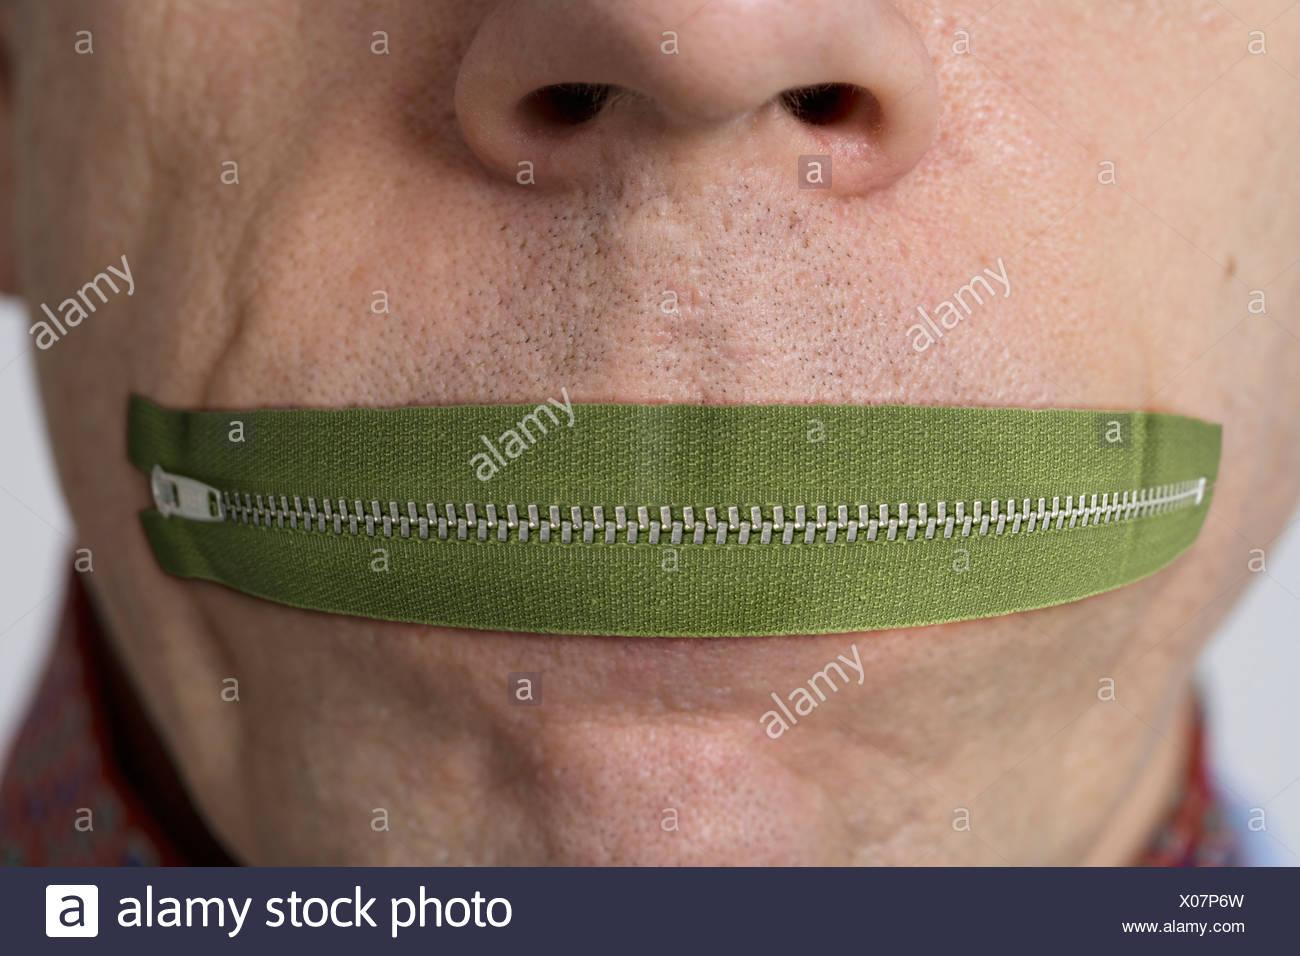 Zip Your Lip X P W on Zipped Mouth Cartoon